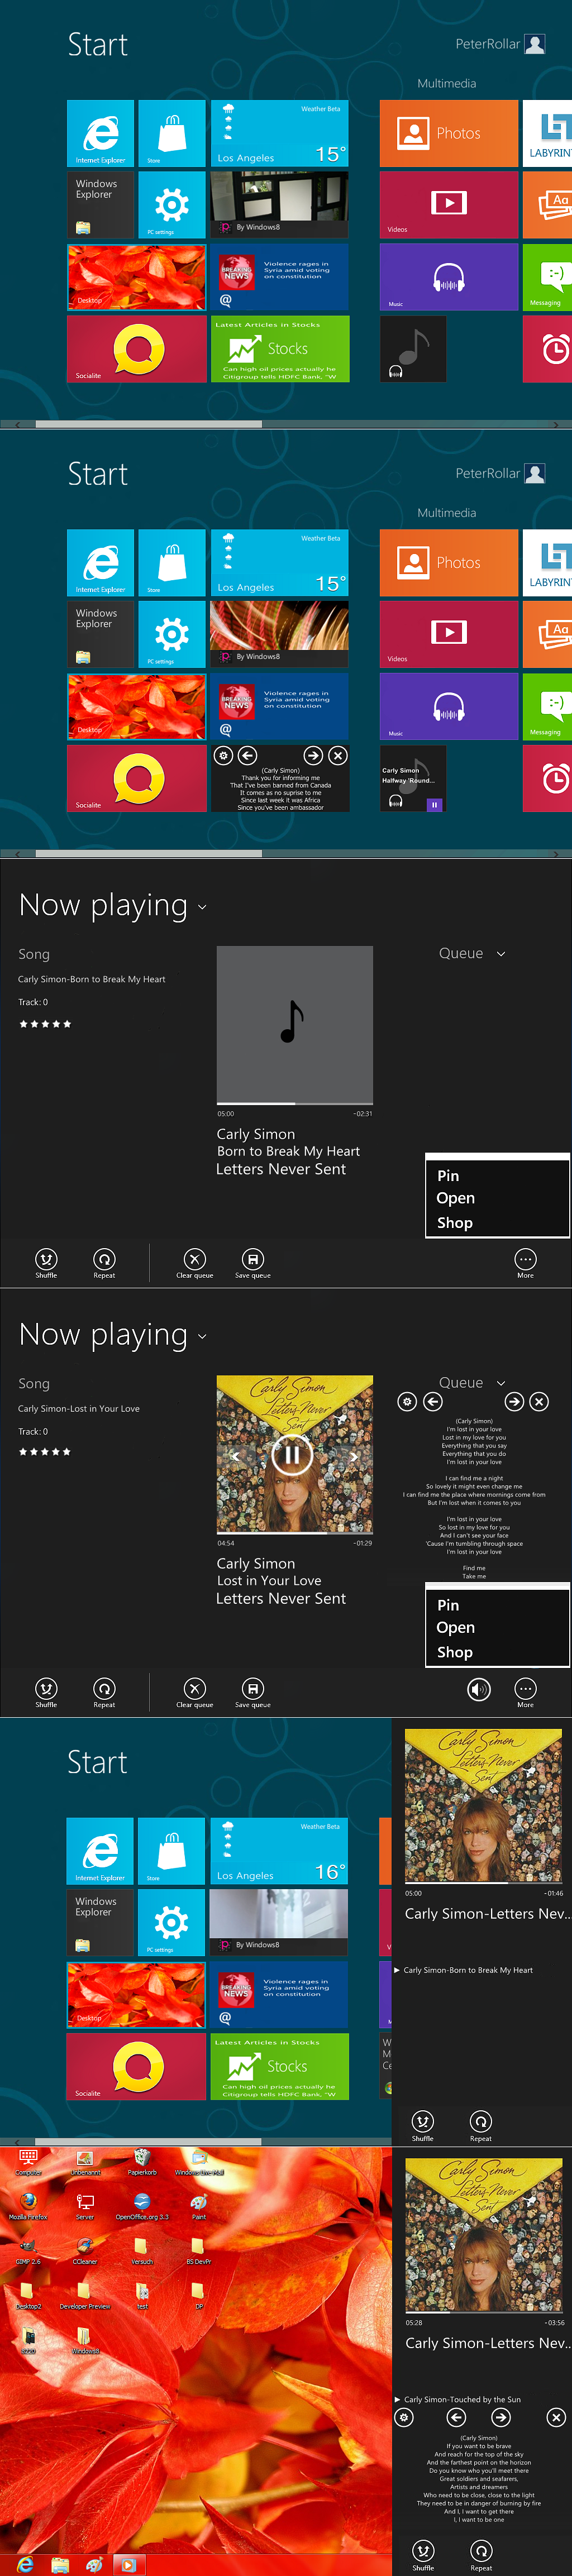 Windows 8 music player beta by PeterRollar